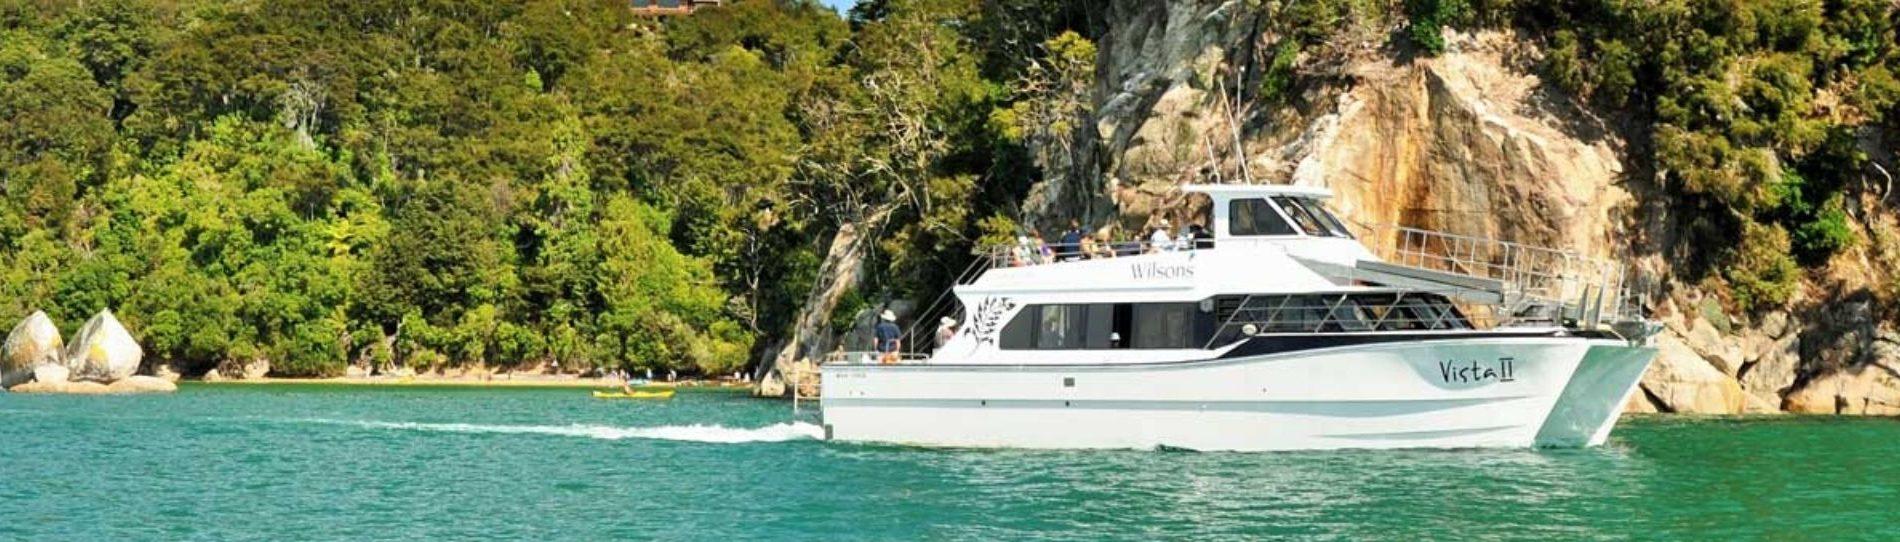 bucks party cruise rotorua new zealand